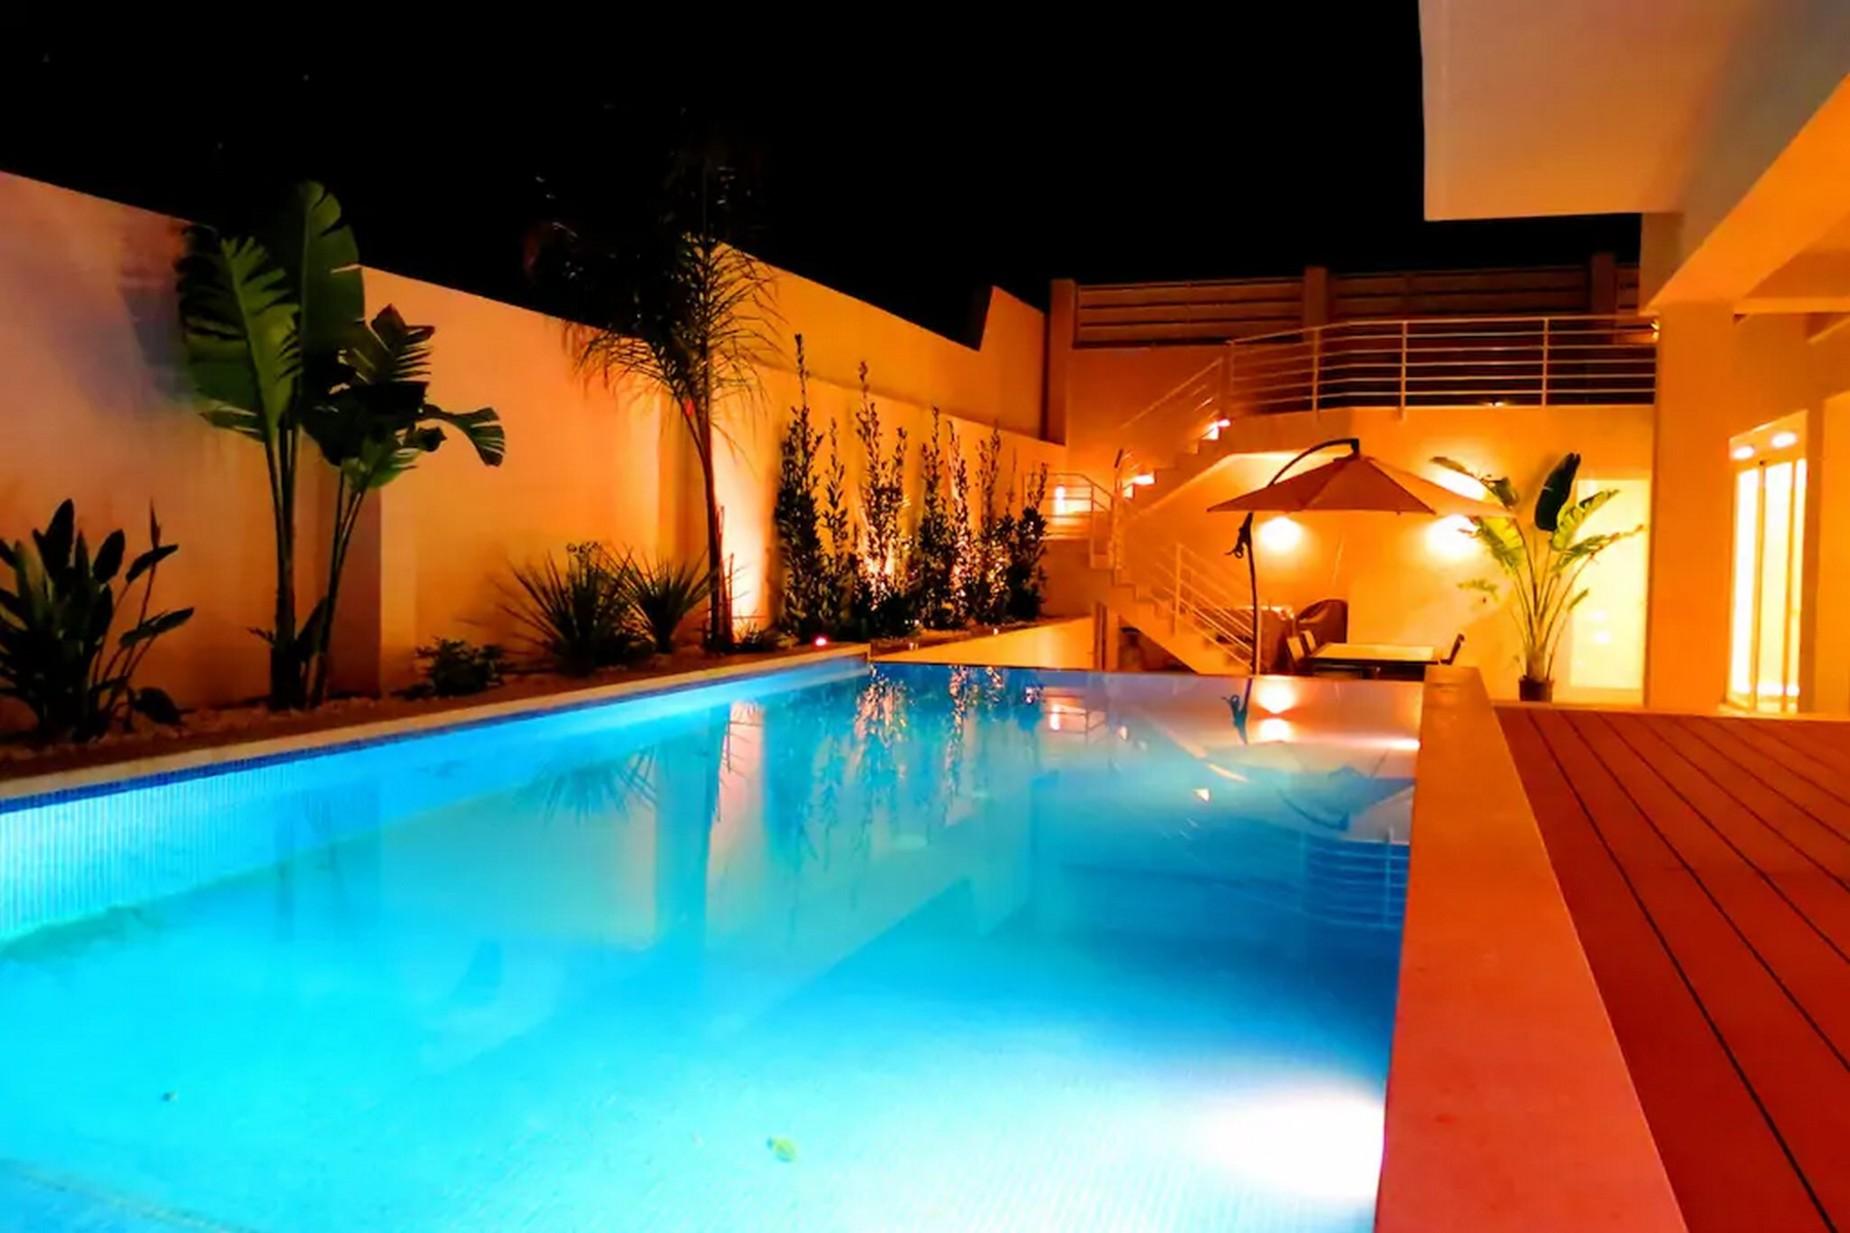 3 bed Villa For Rent in Iklin, Iklin - thumb 15